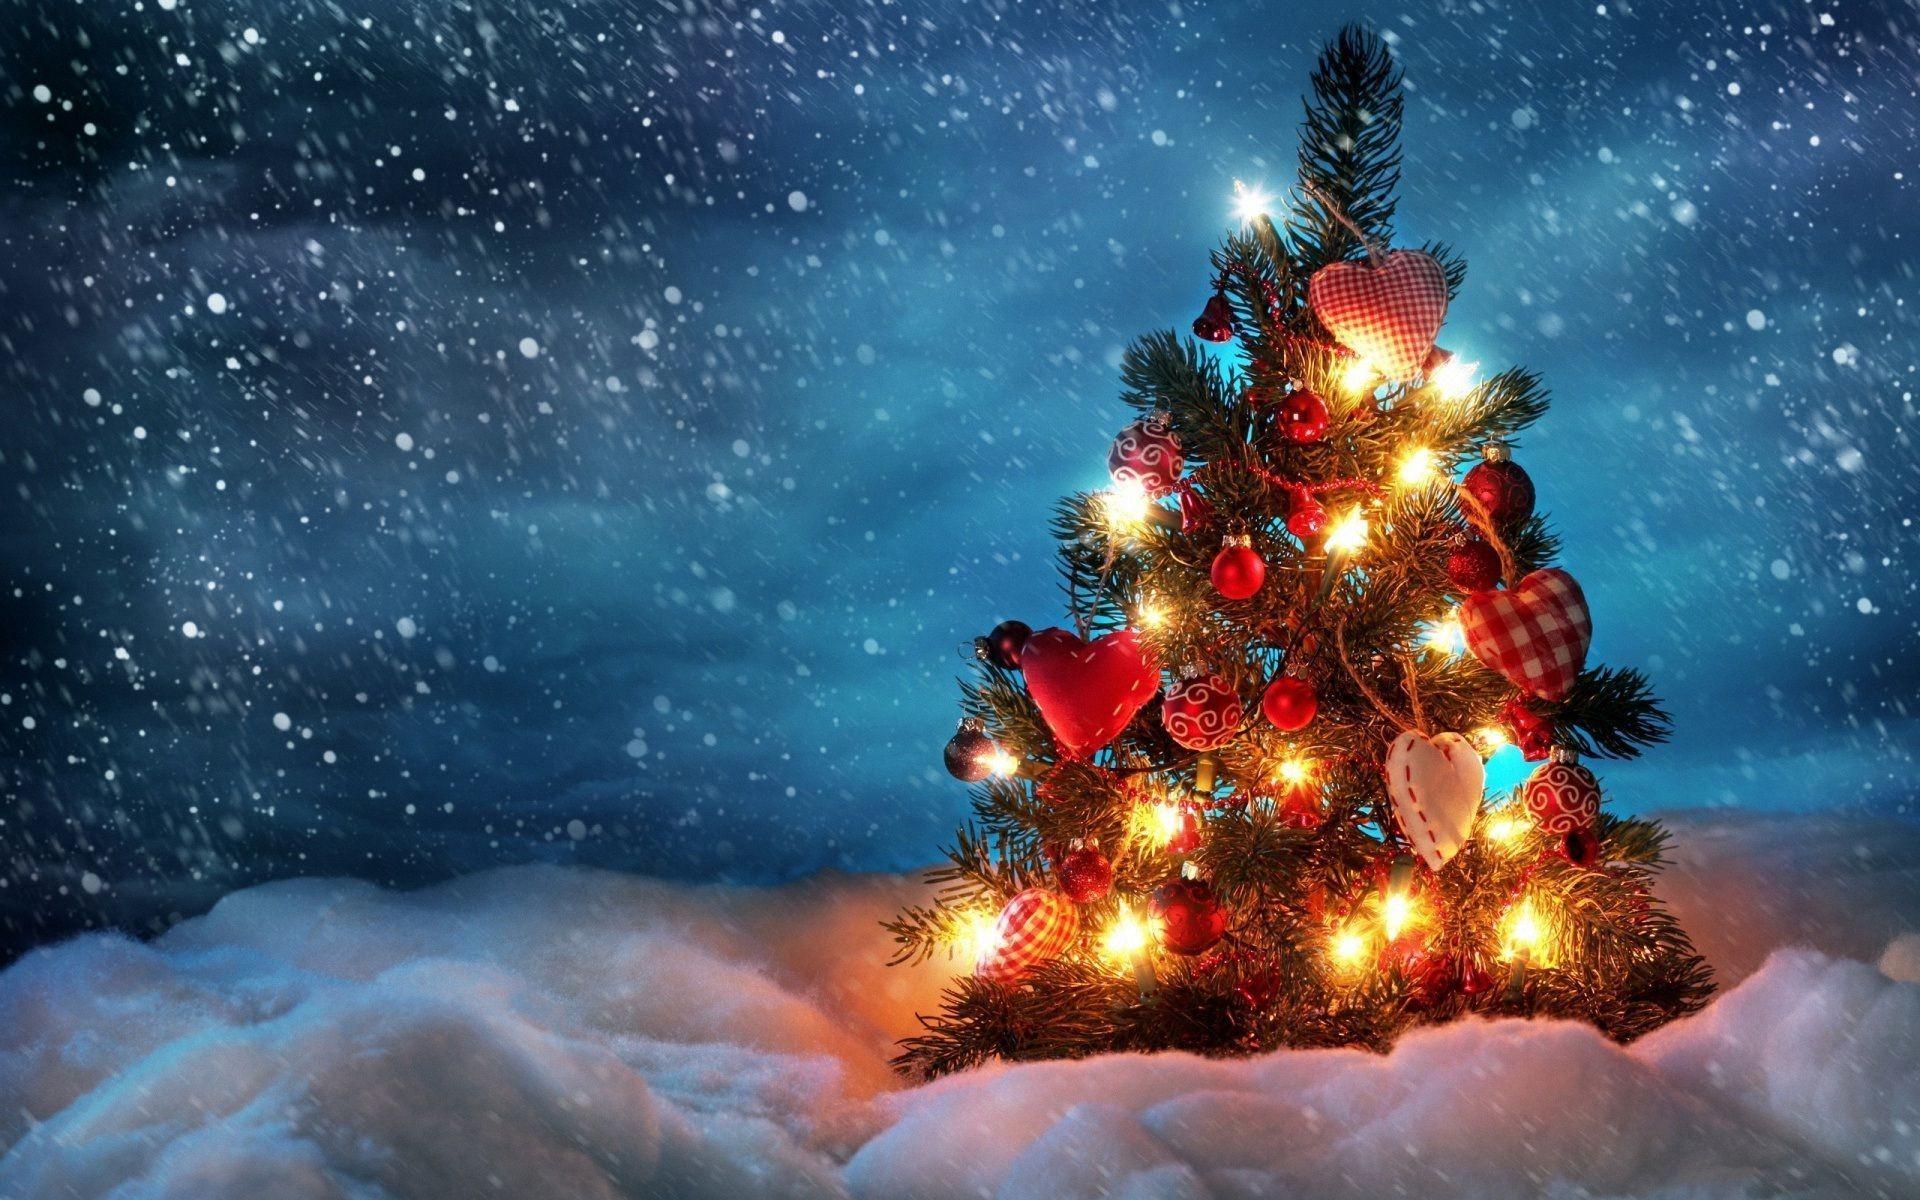 Christmas Tree Wallpaper High Quality Resolution